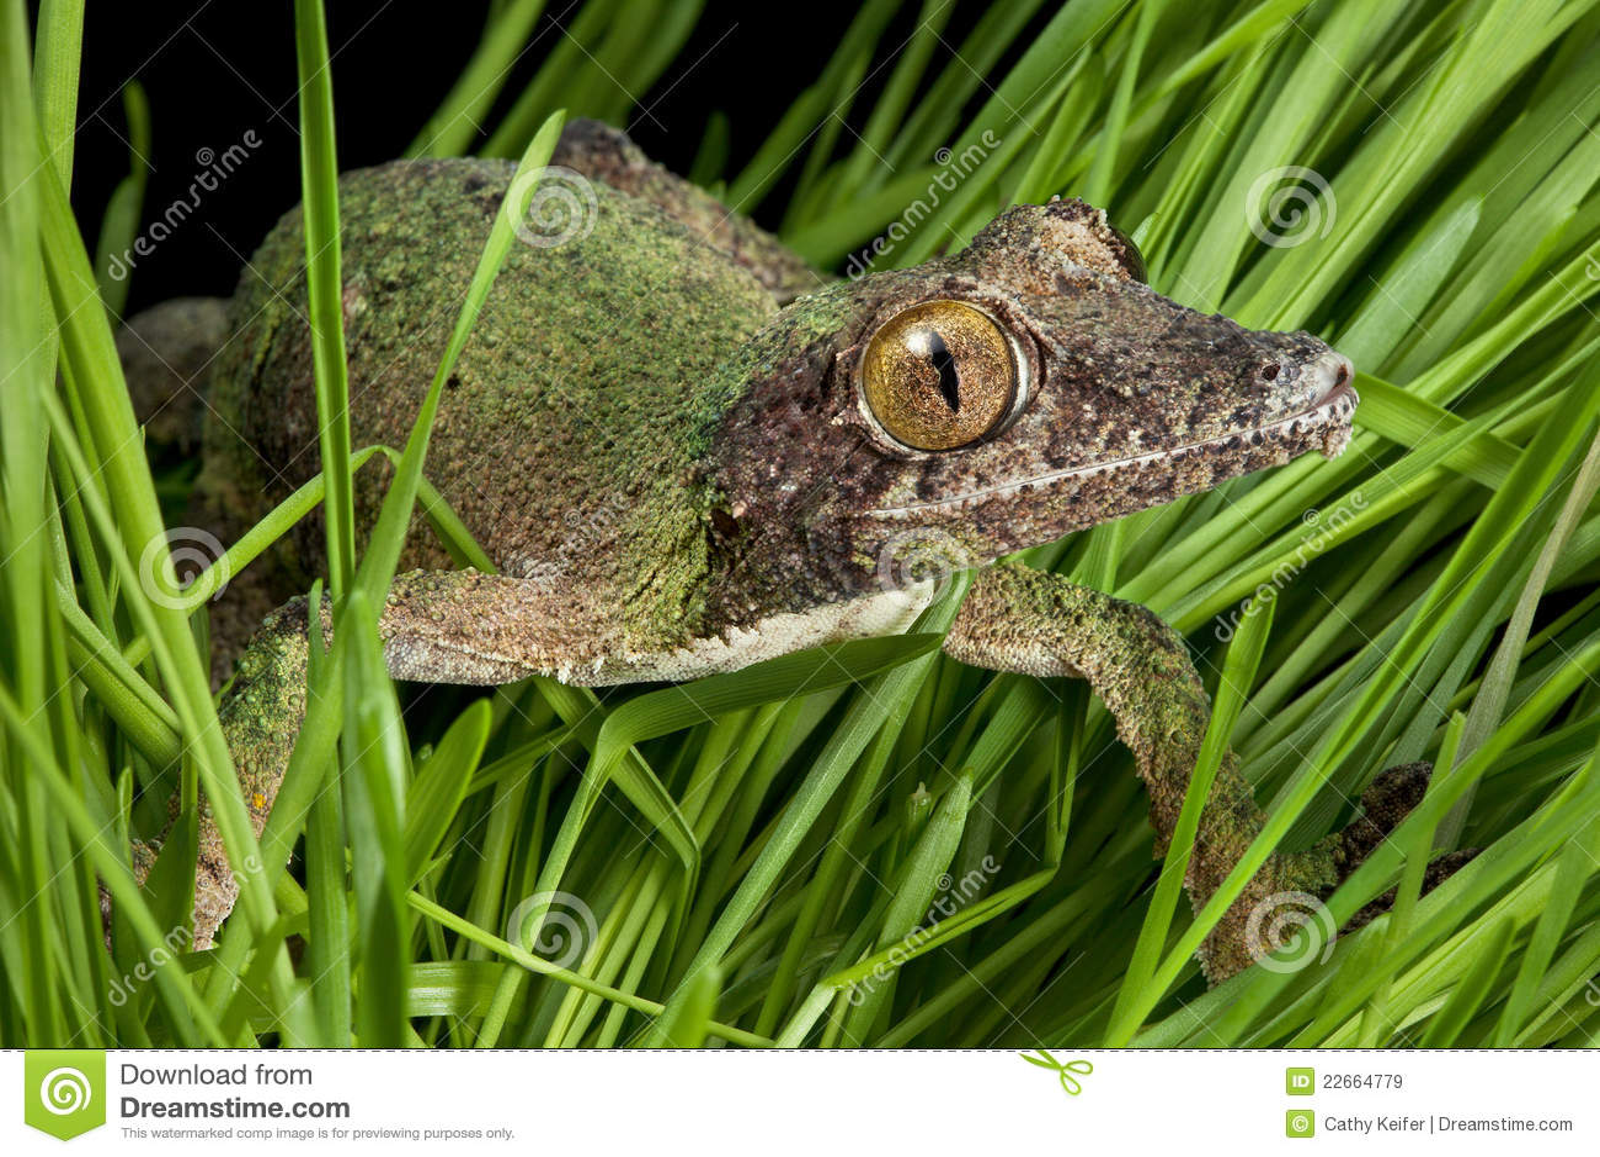 Gecko crawling through grass